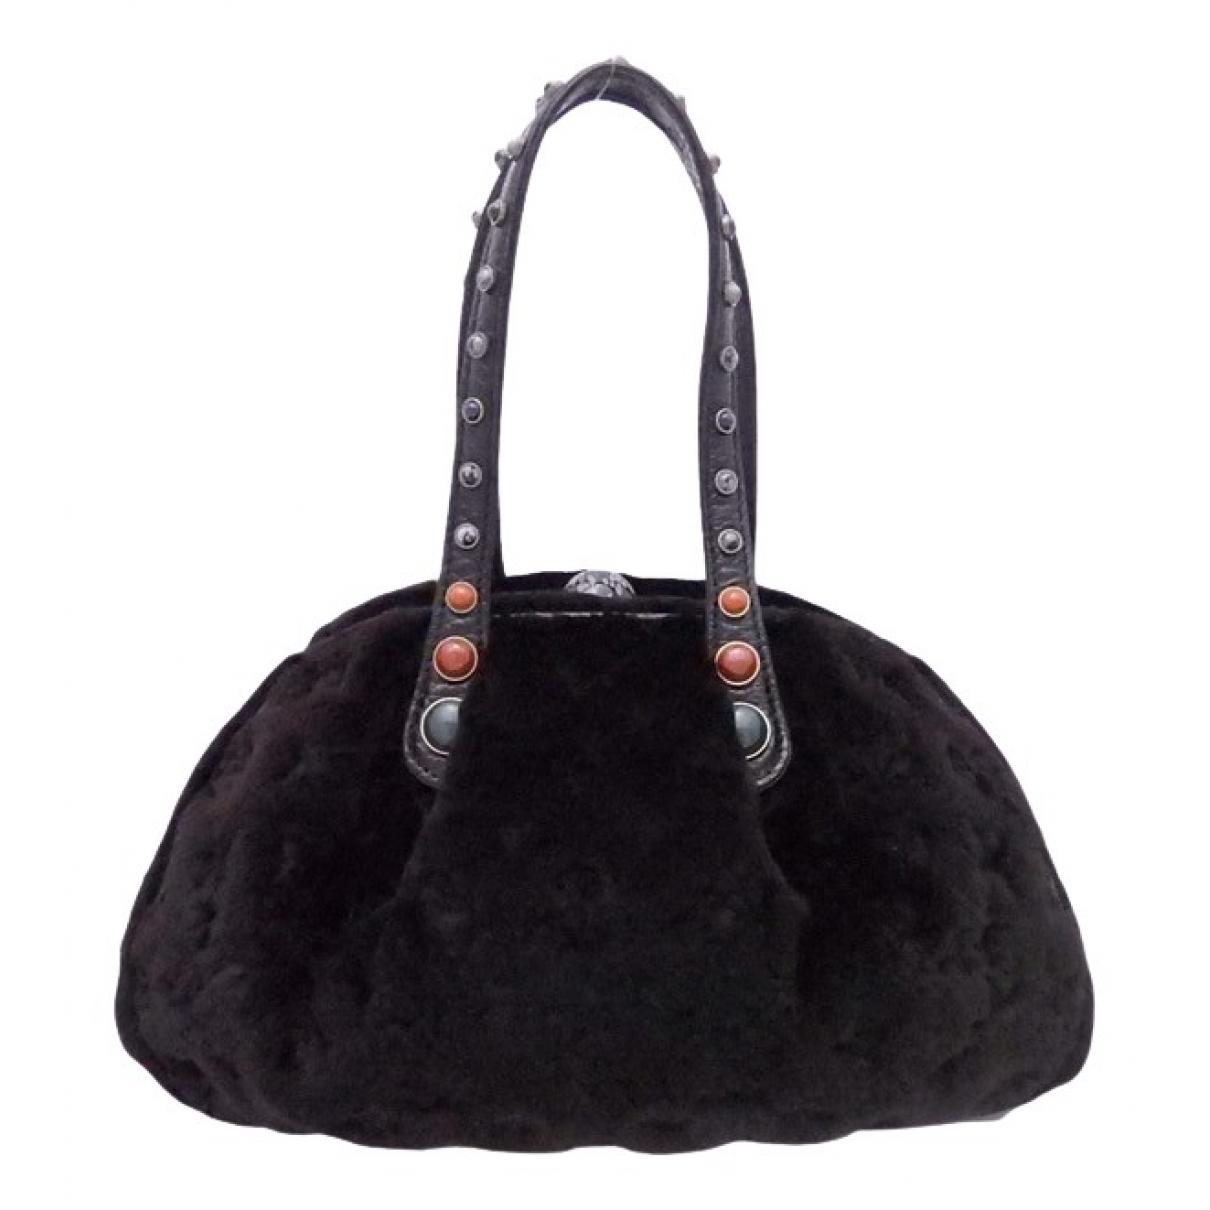 Louis Vuitton \N Brown Fur handbag for Women \N